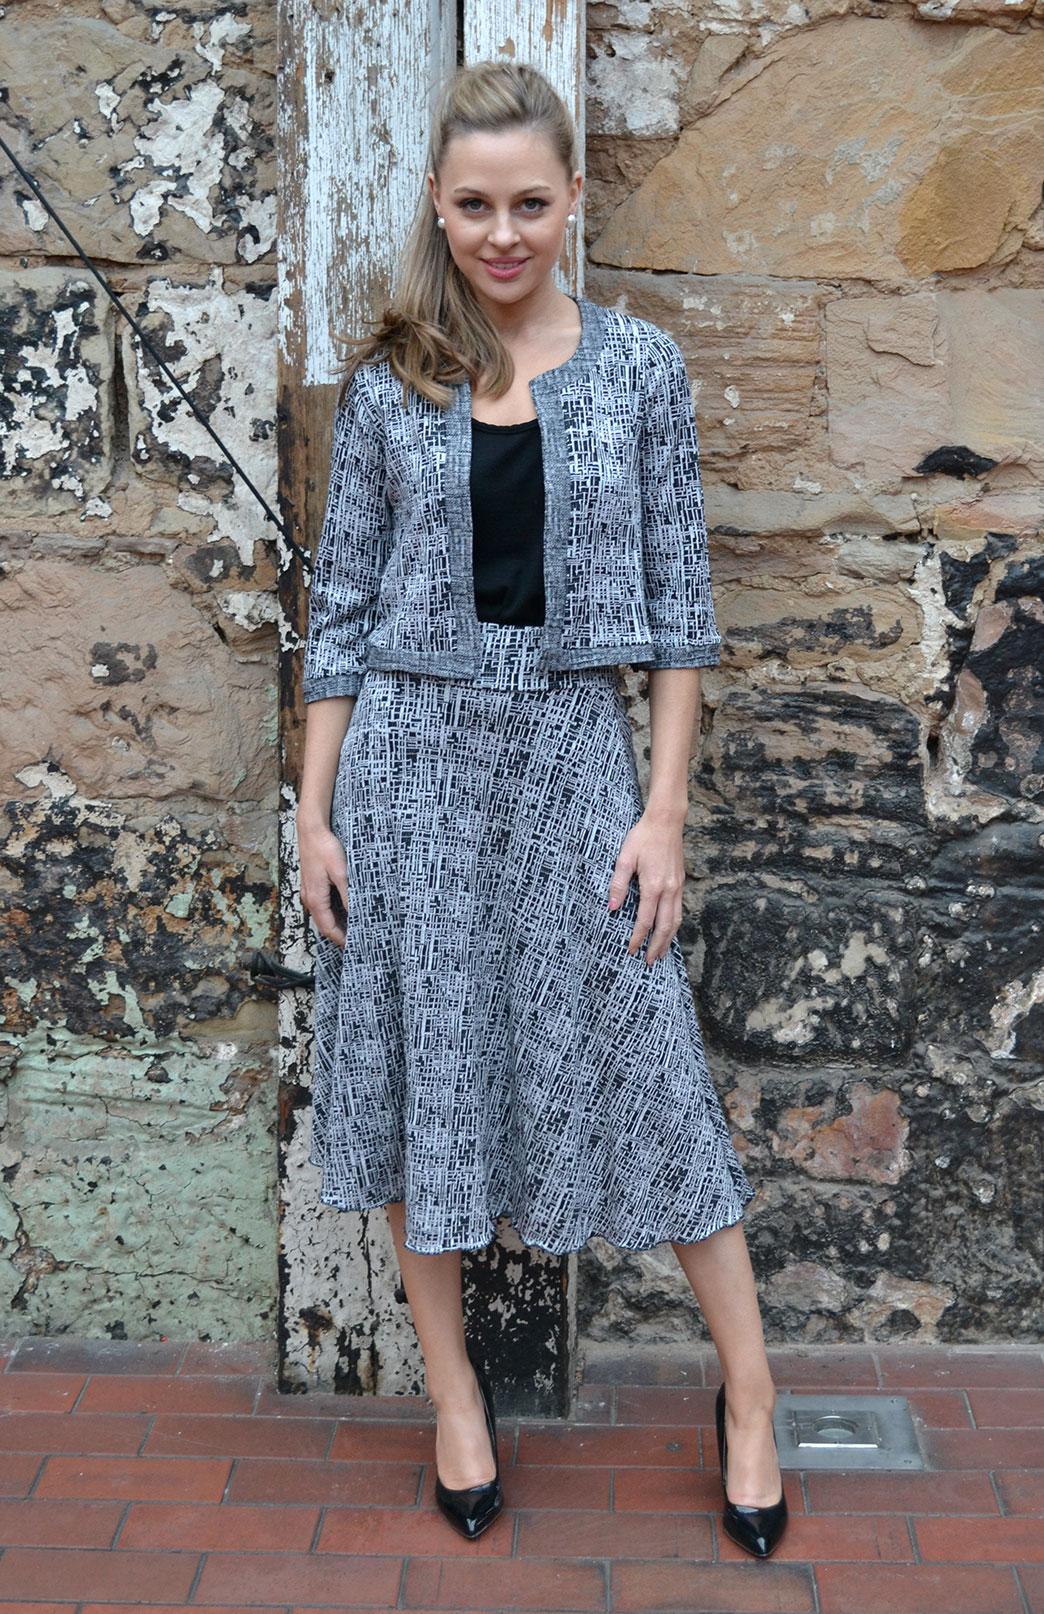 Coco Jacket - Women's Pure Wool Black and White Cropped Bolero Jacket - Smitten Merino Tasmania Australia